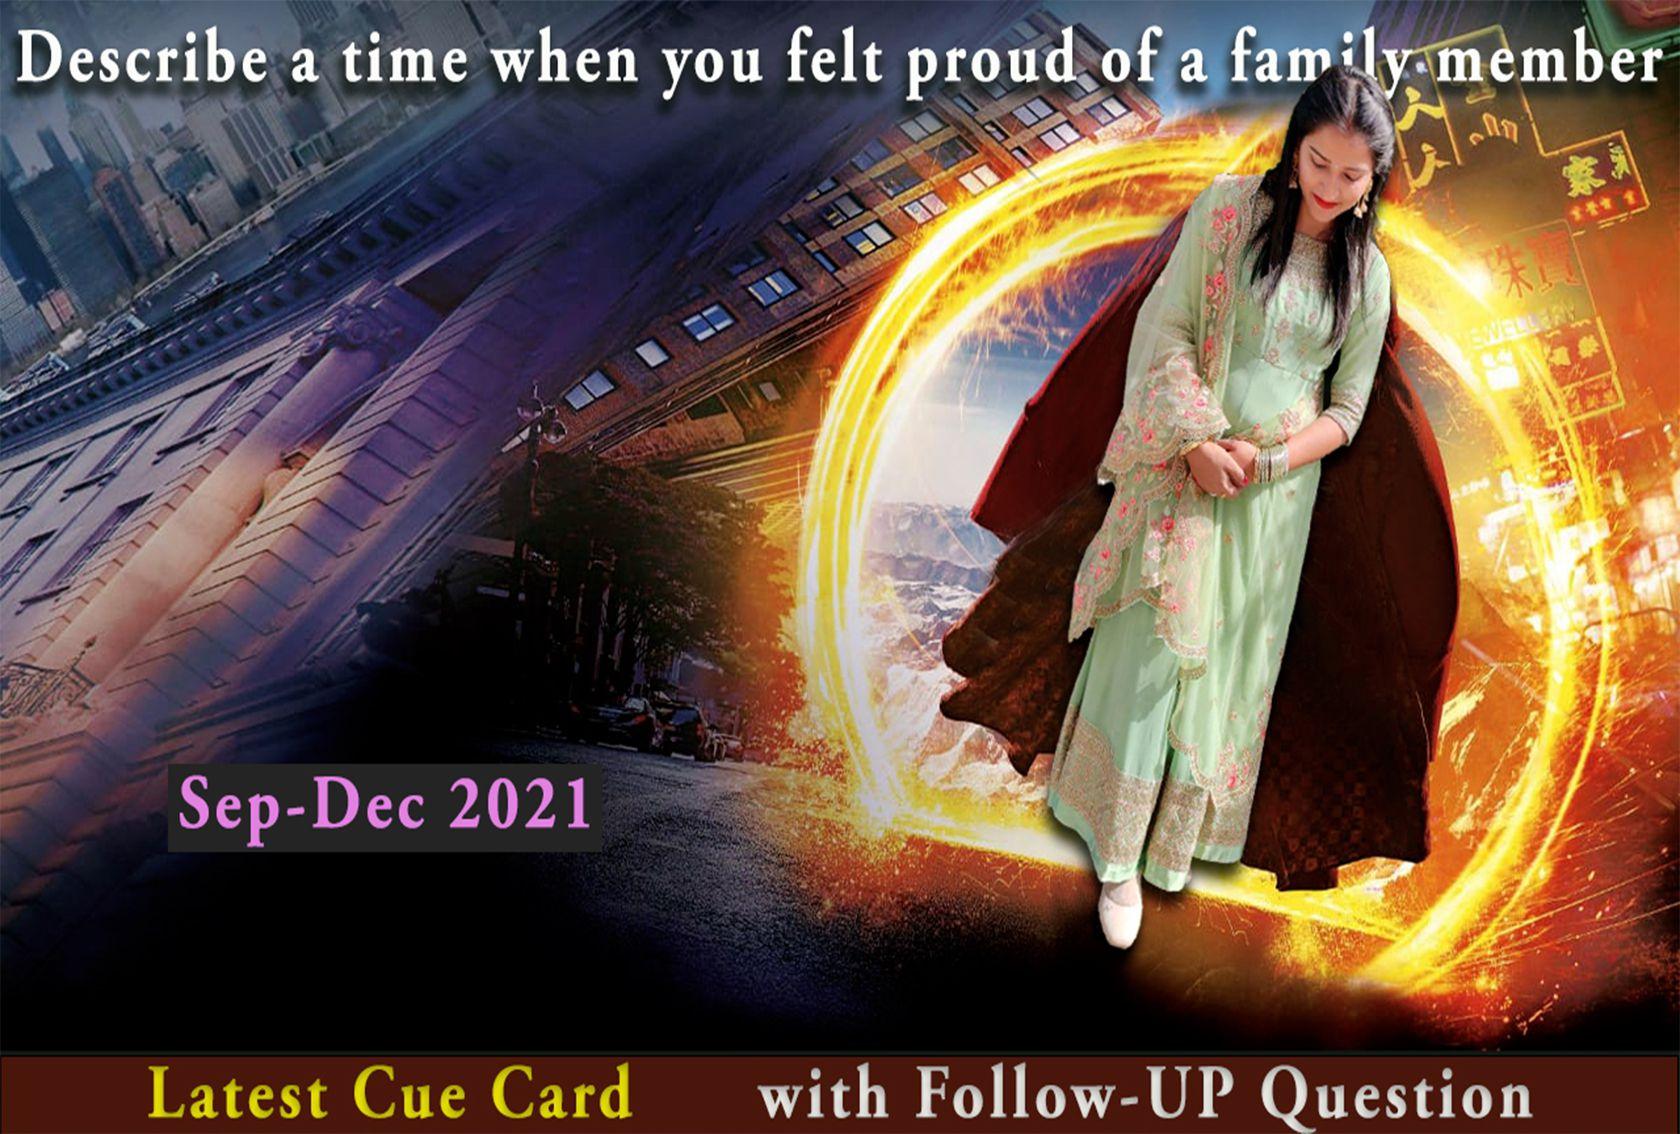 Describe a time when you felt proud of a family member Cue Card